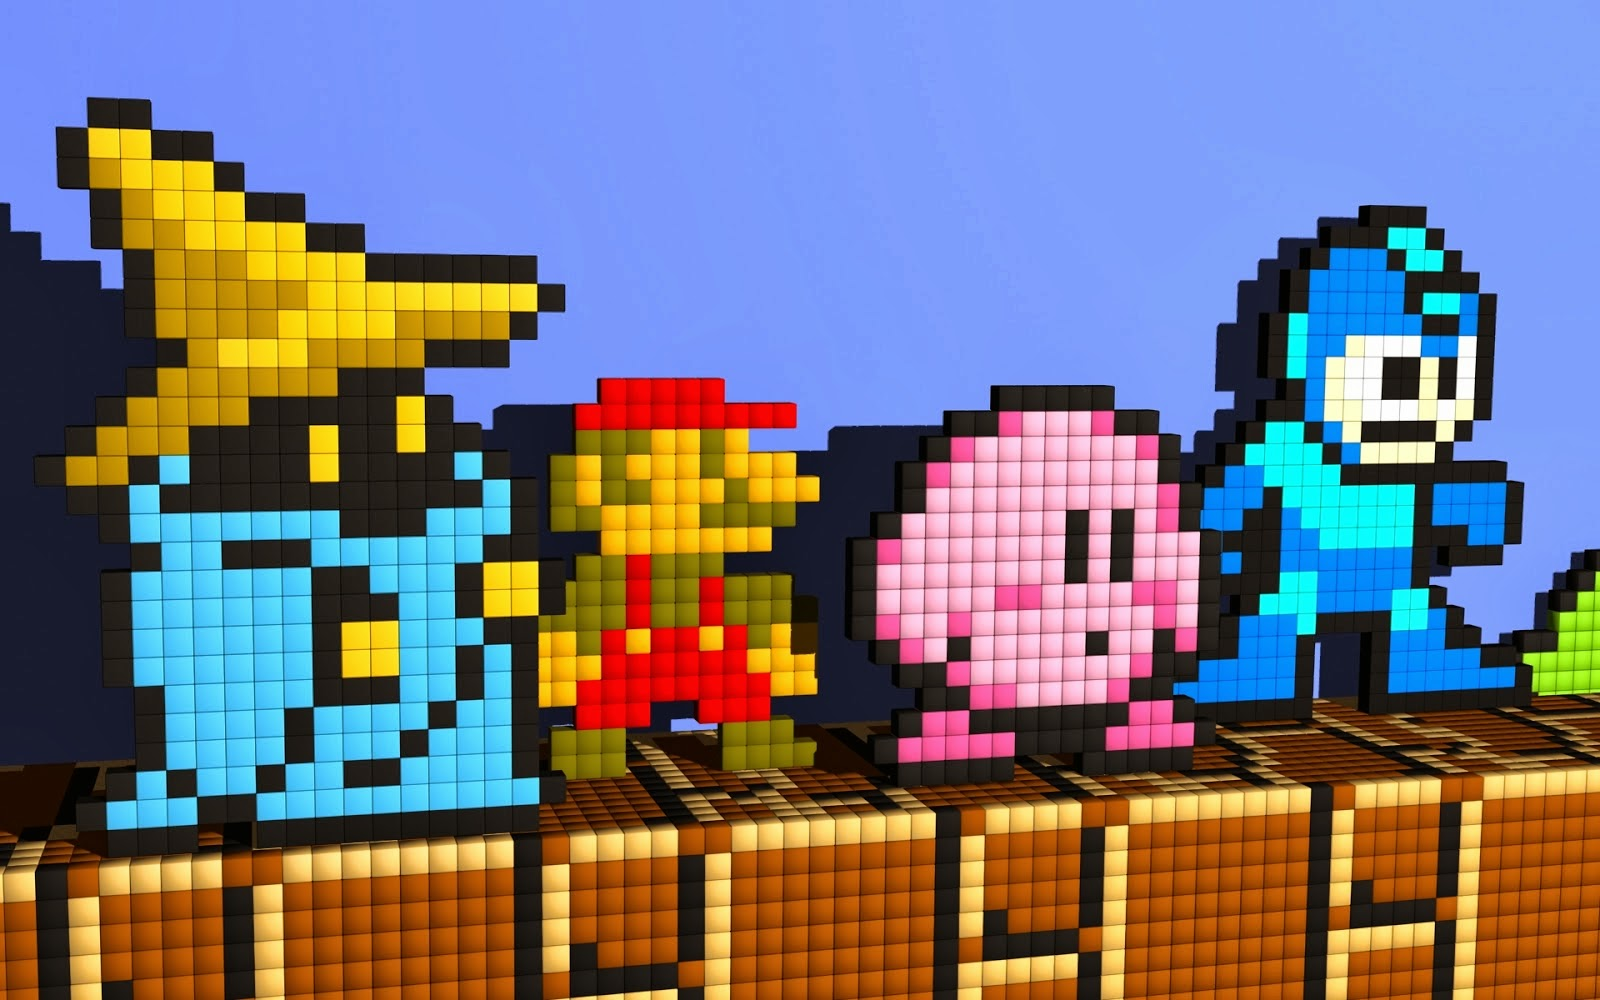 8 bit Black Mage Mario Kirby Megaman